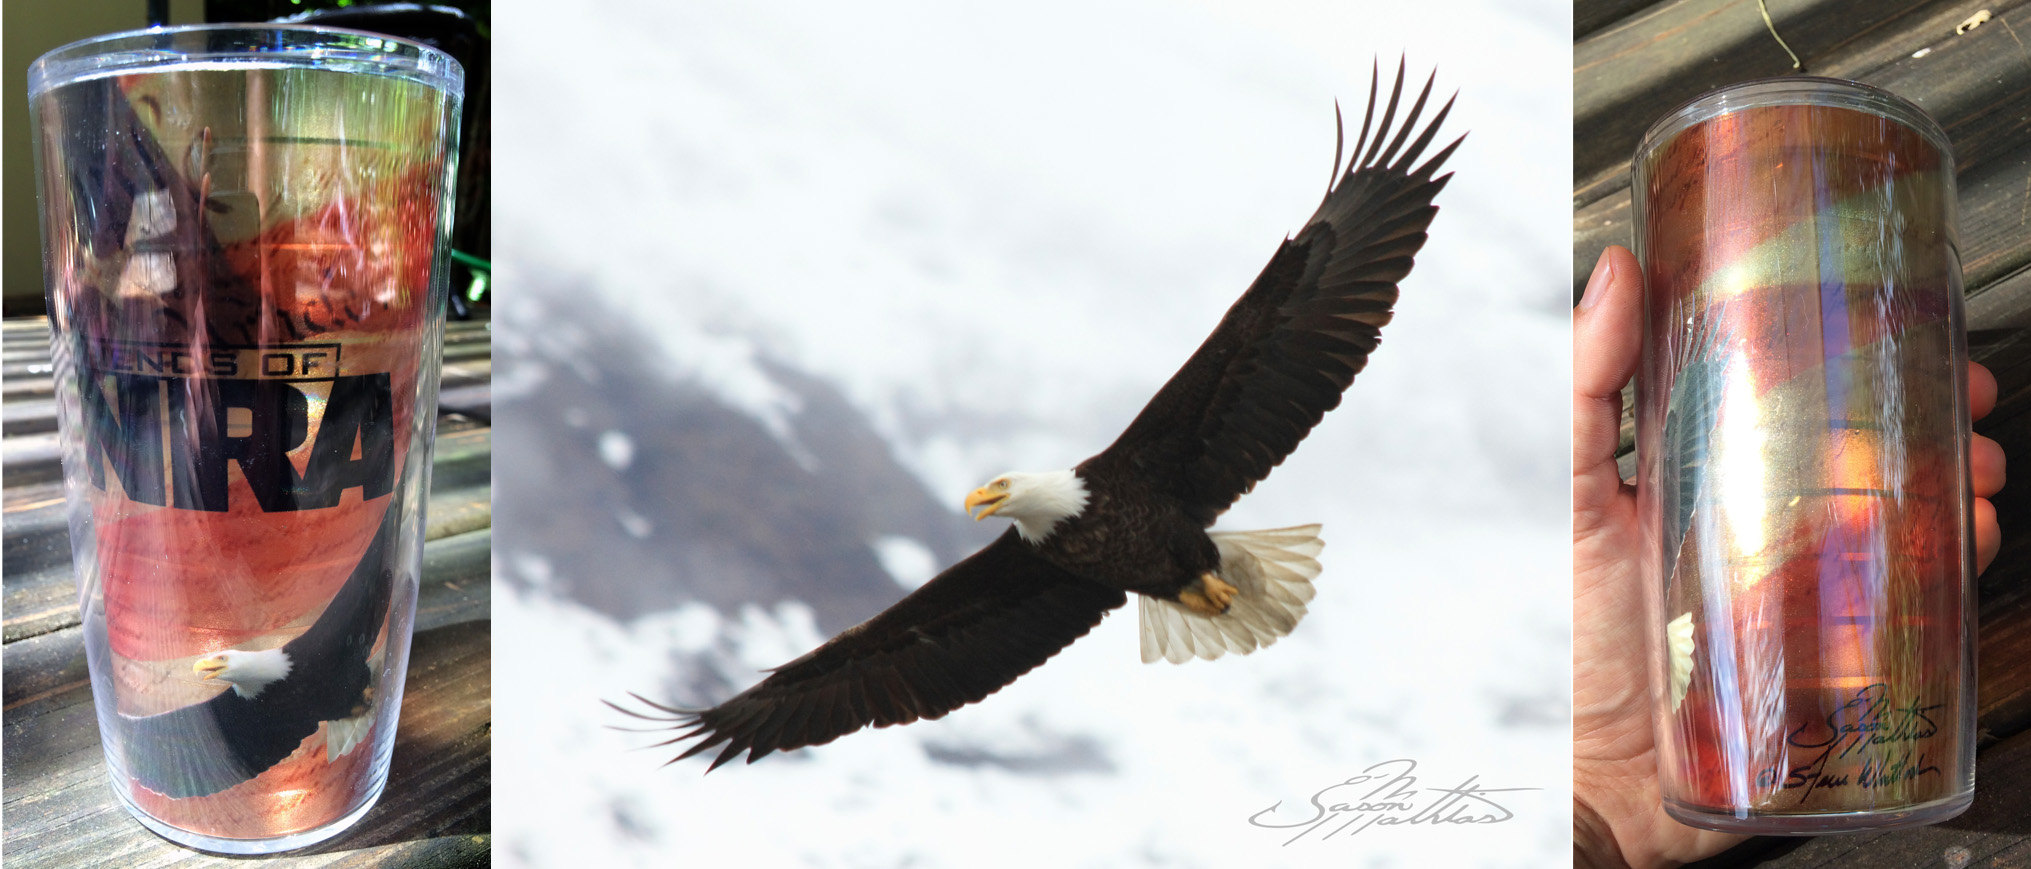 jason-mathias-eagle-photography-nra.jpg